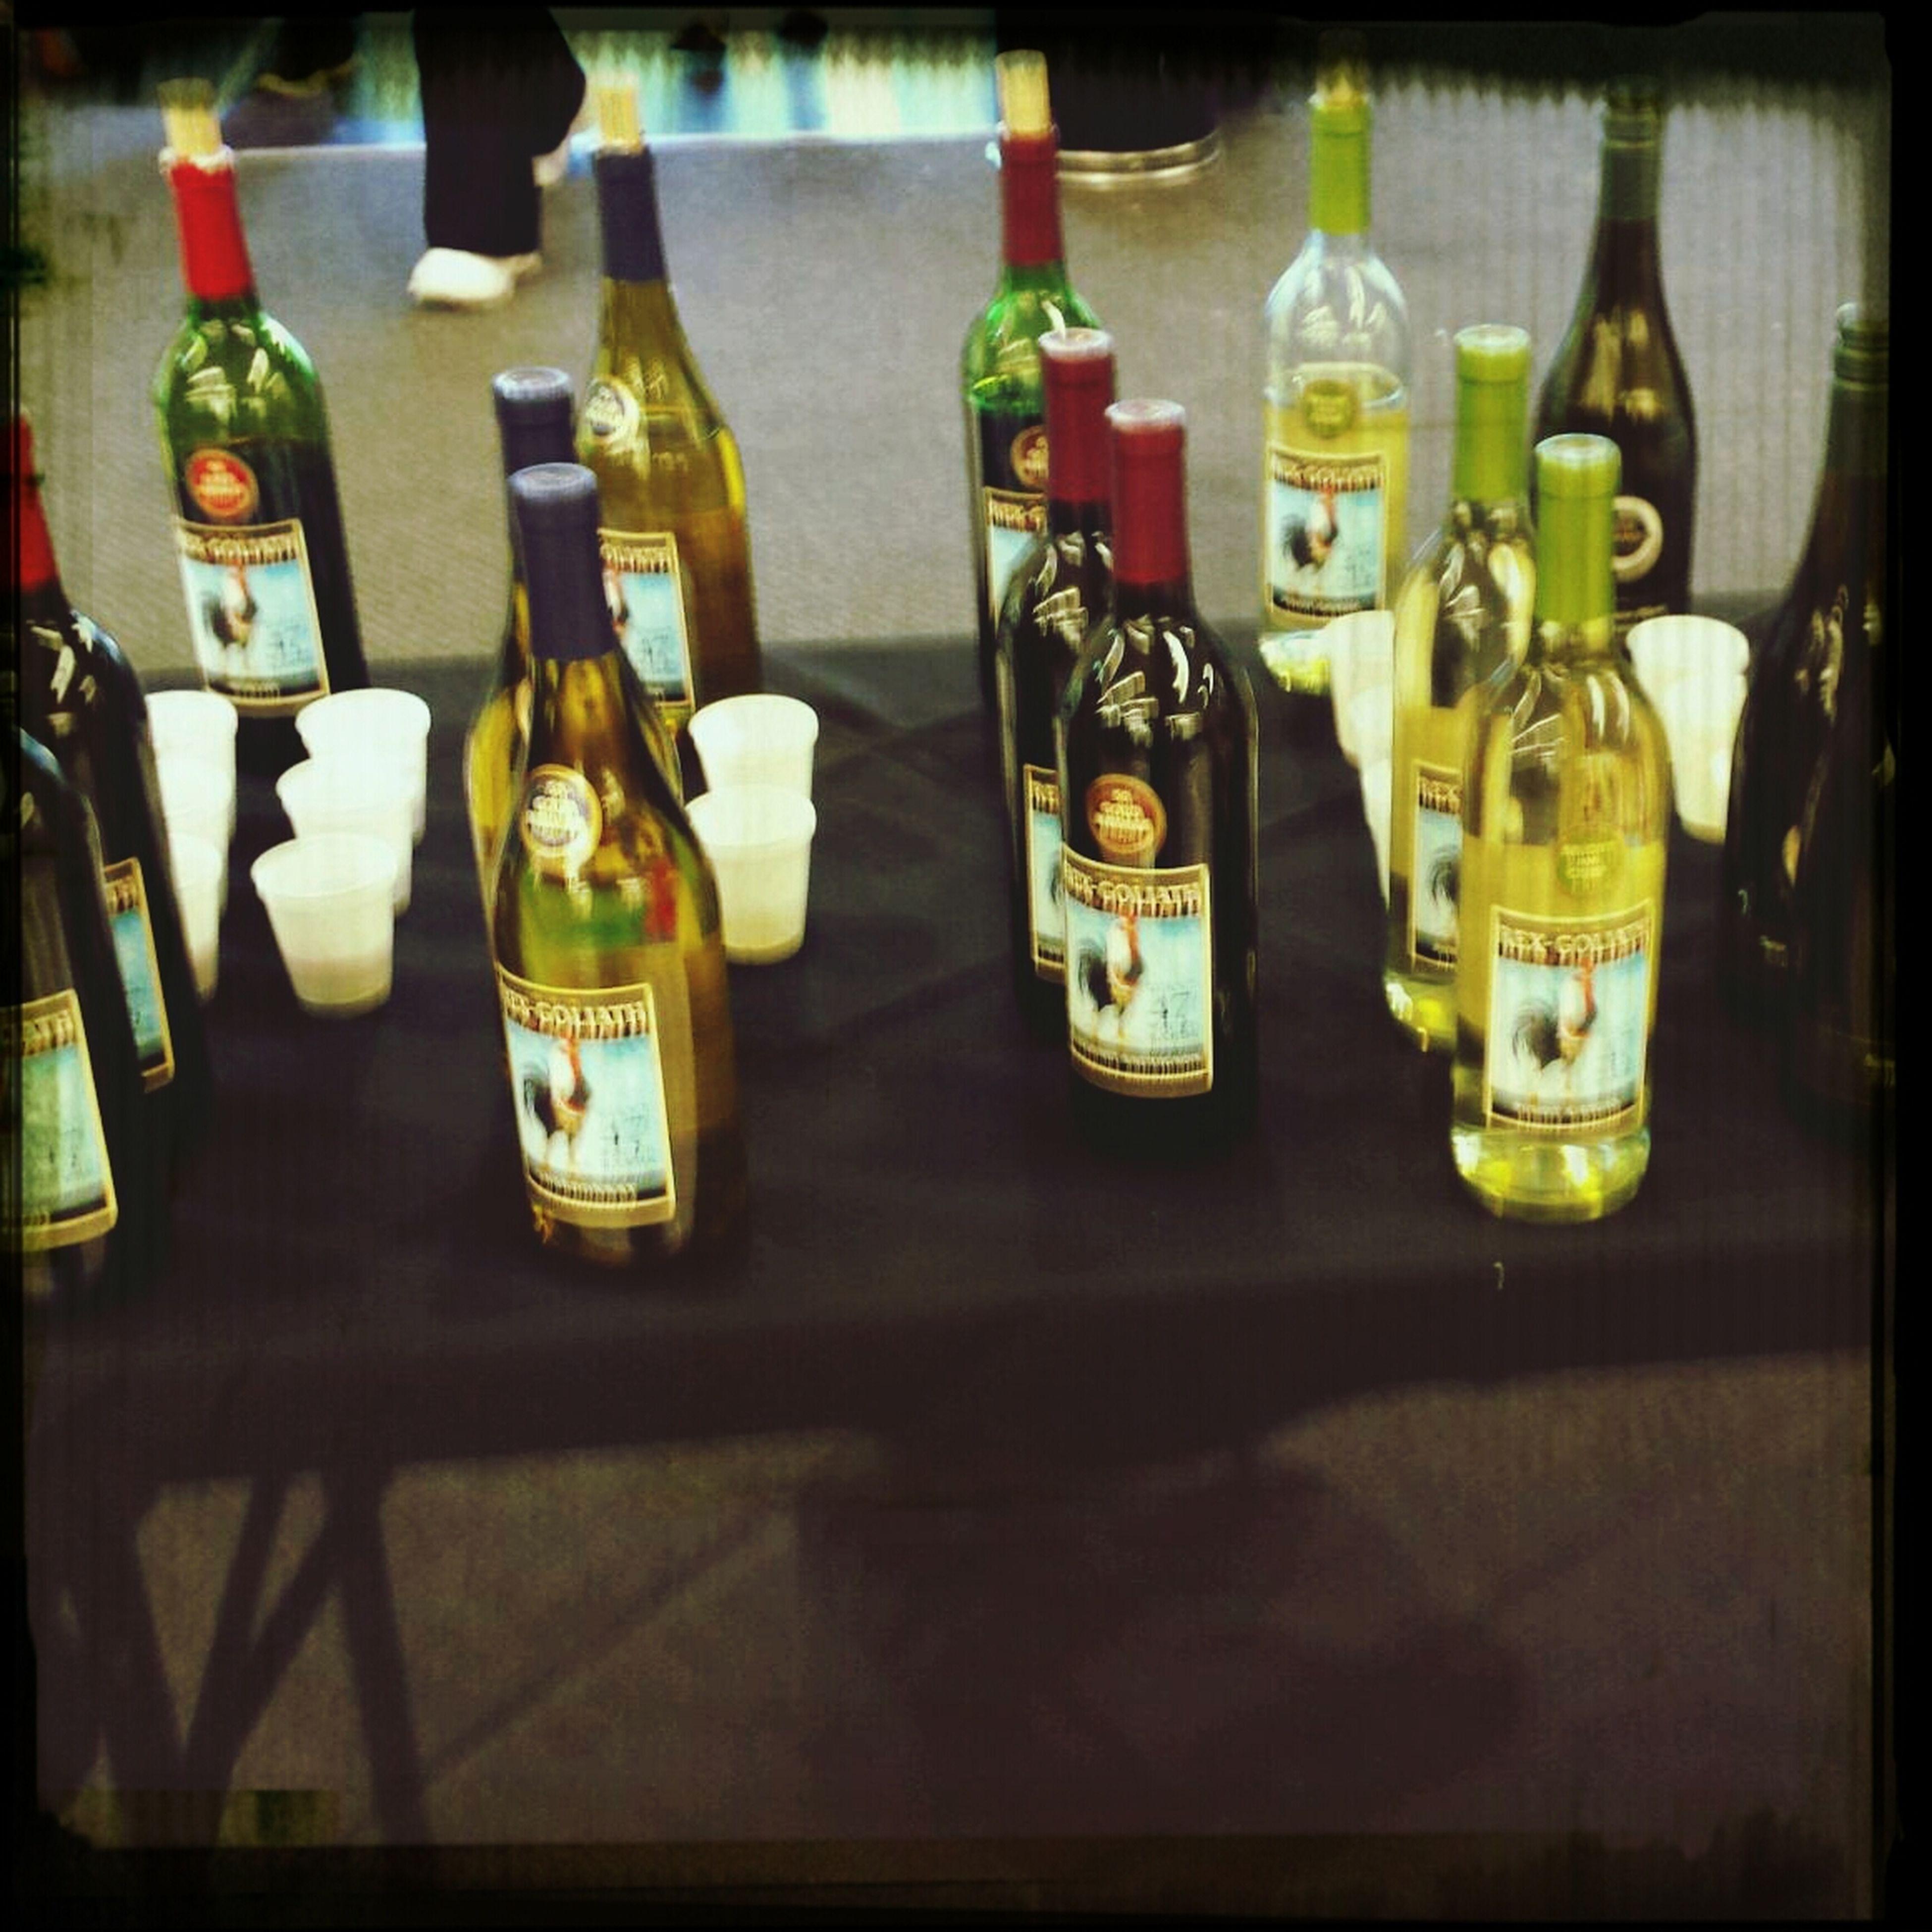 Wine Tasting! Events By Kat Rex Goliath Kim Crawford